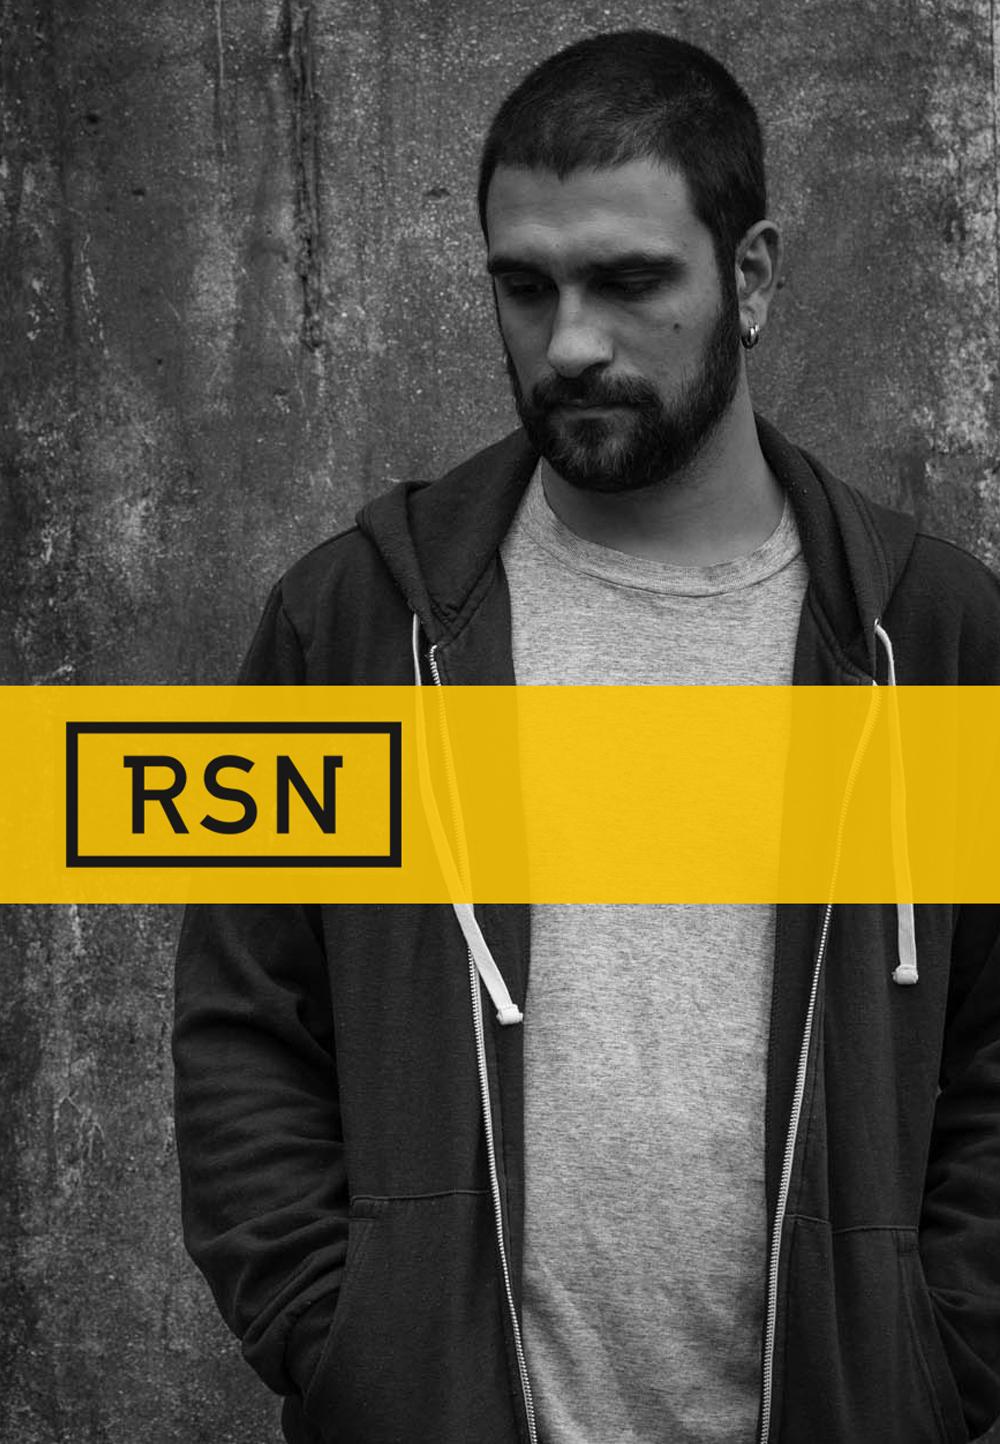 rsn_low